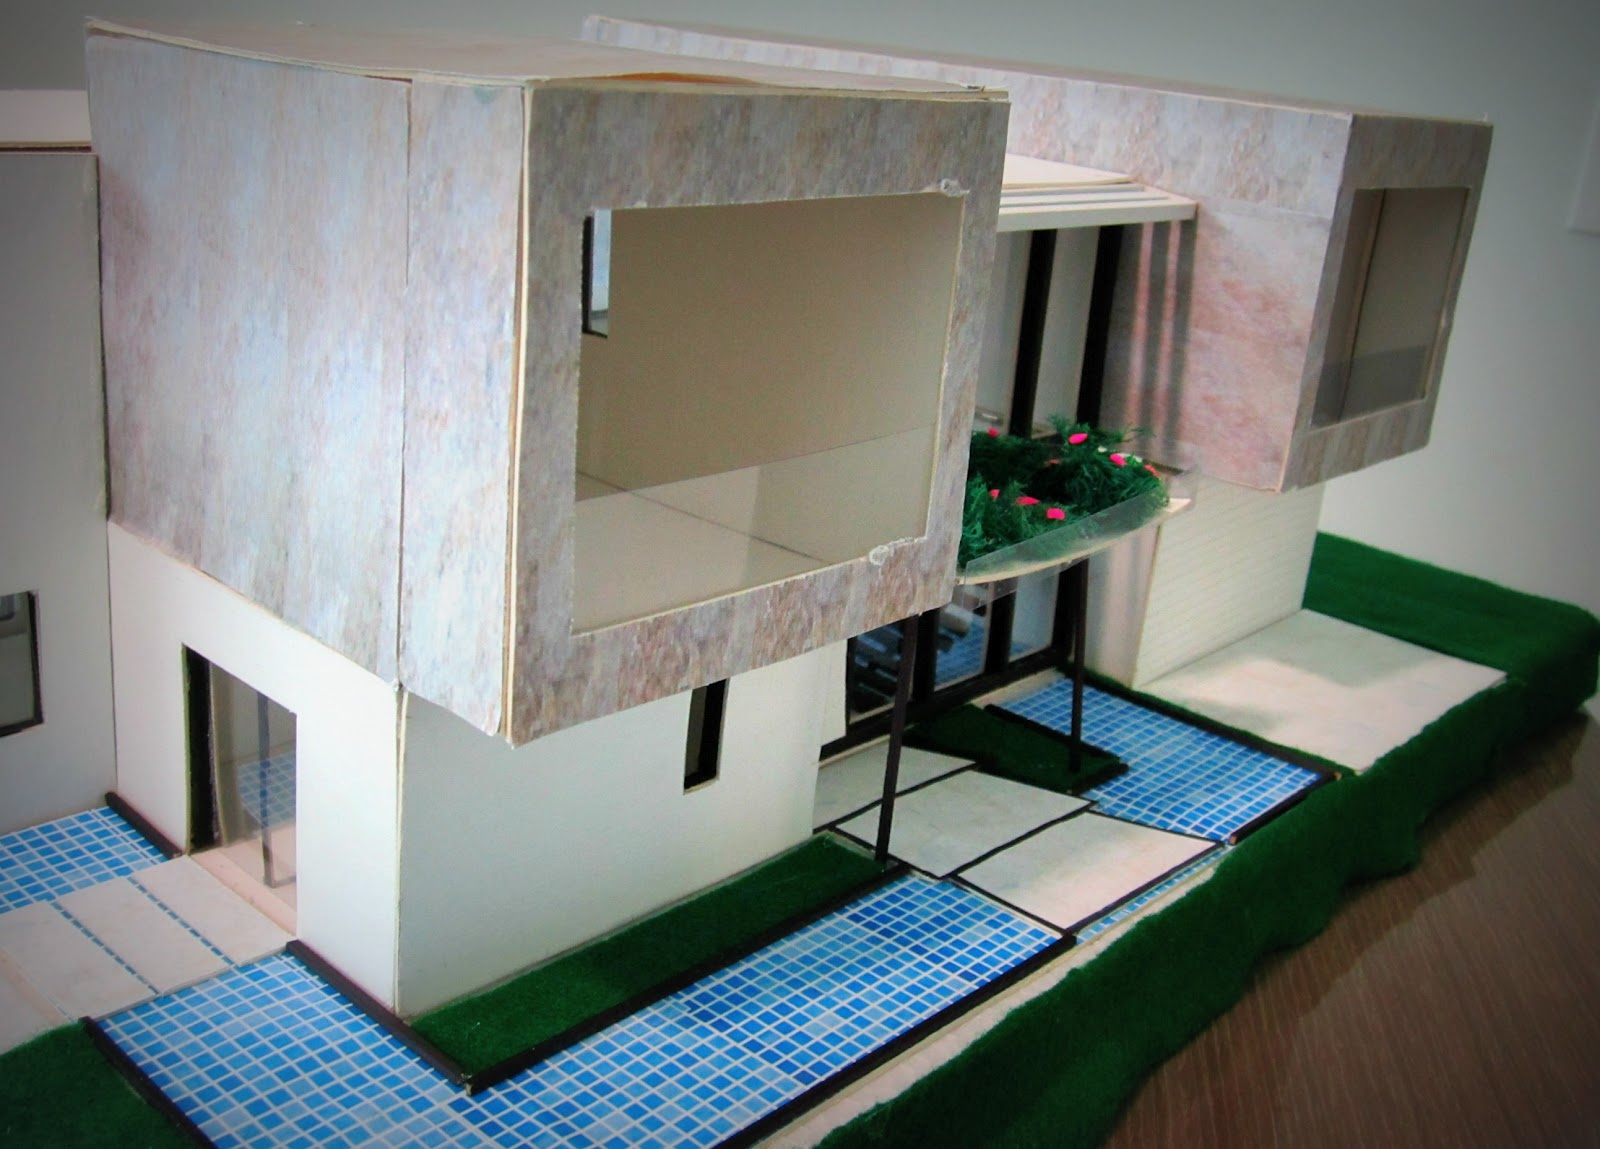 Arquitectura proyecto final casa unifamiliar villa santos - Proyecto casa unifamiliar ...